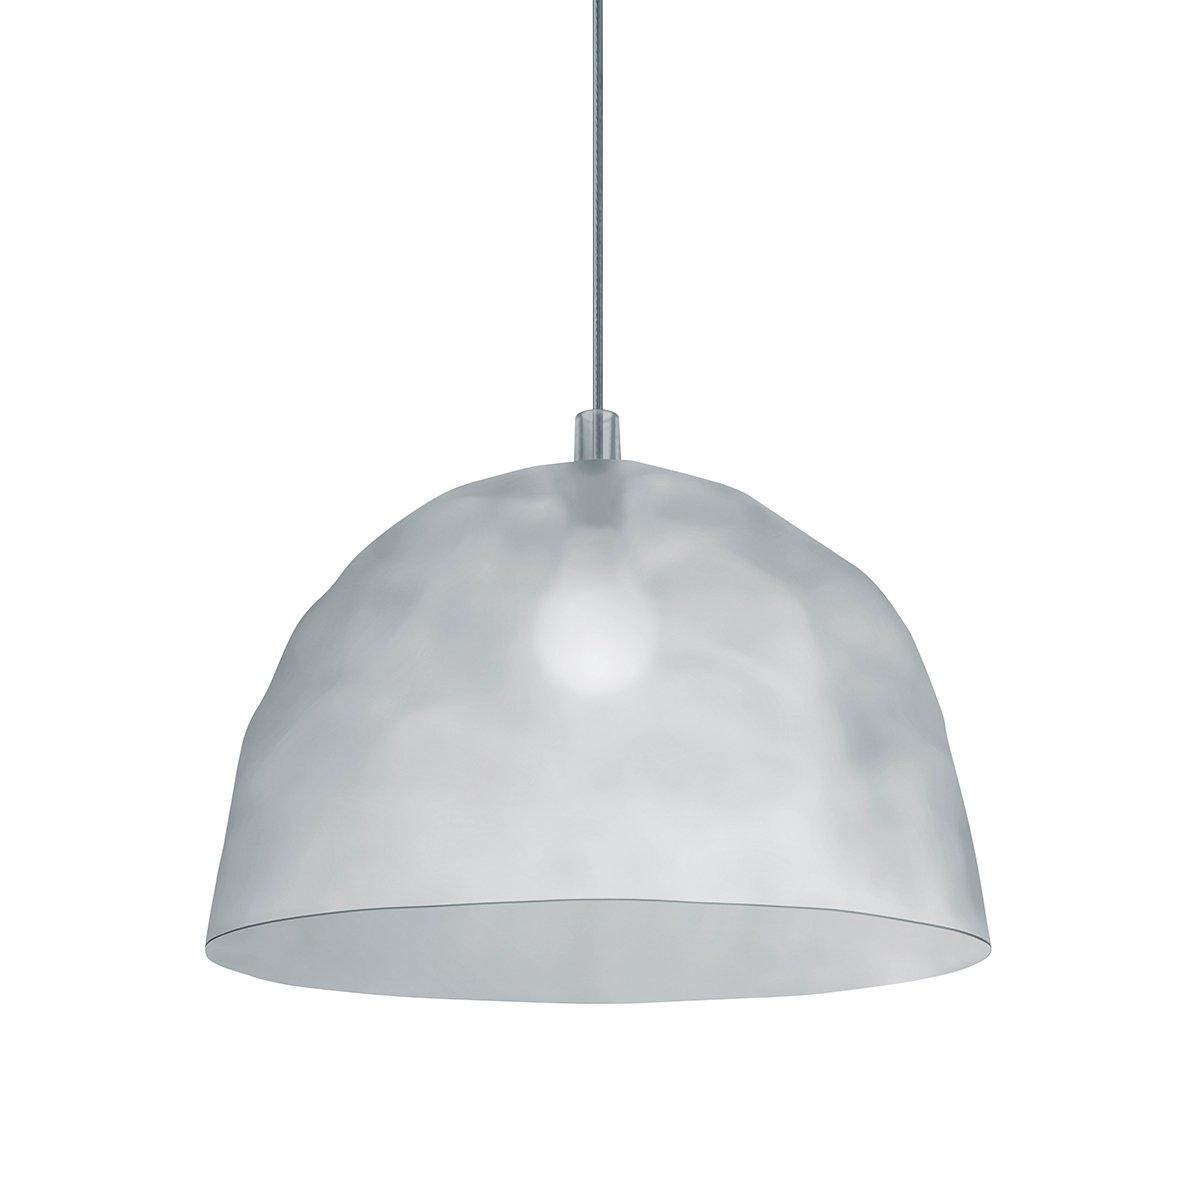 Foscarini Bump Hanglamp - Frost